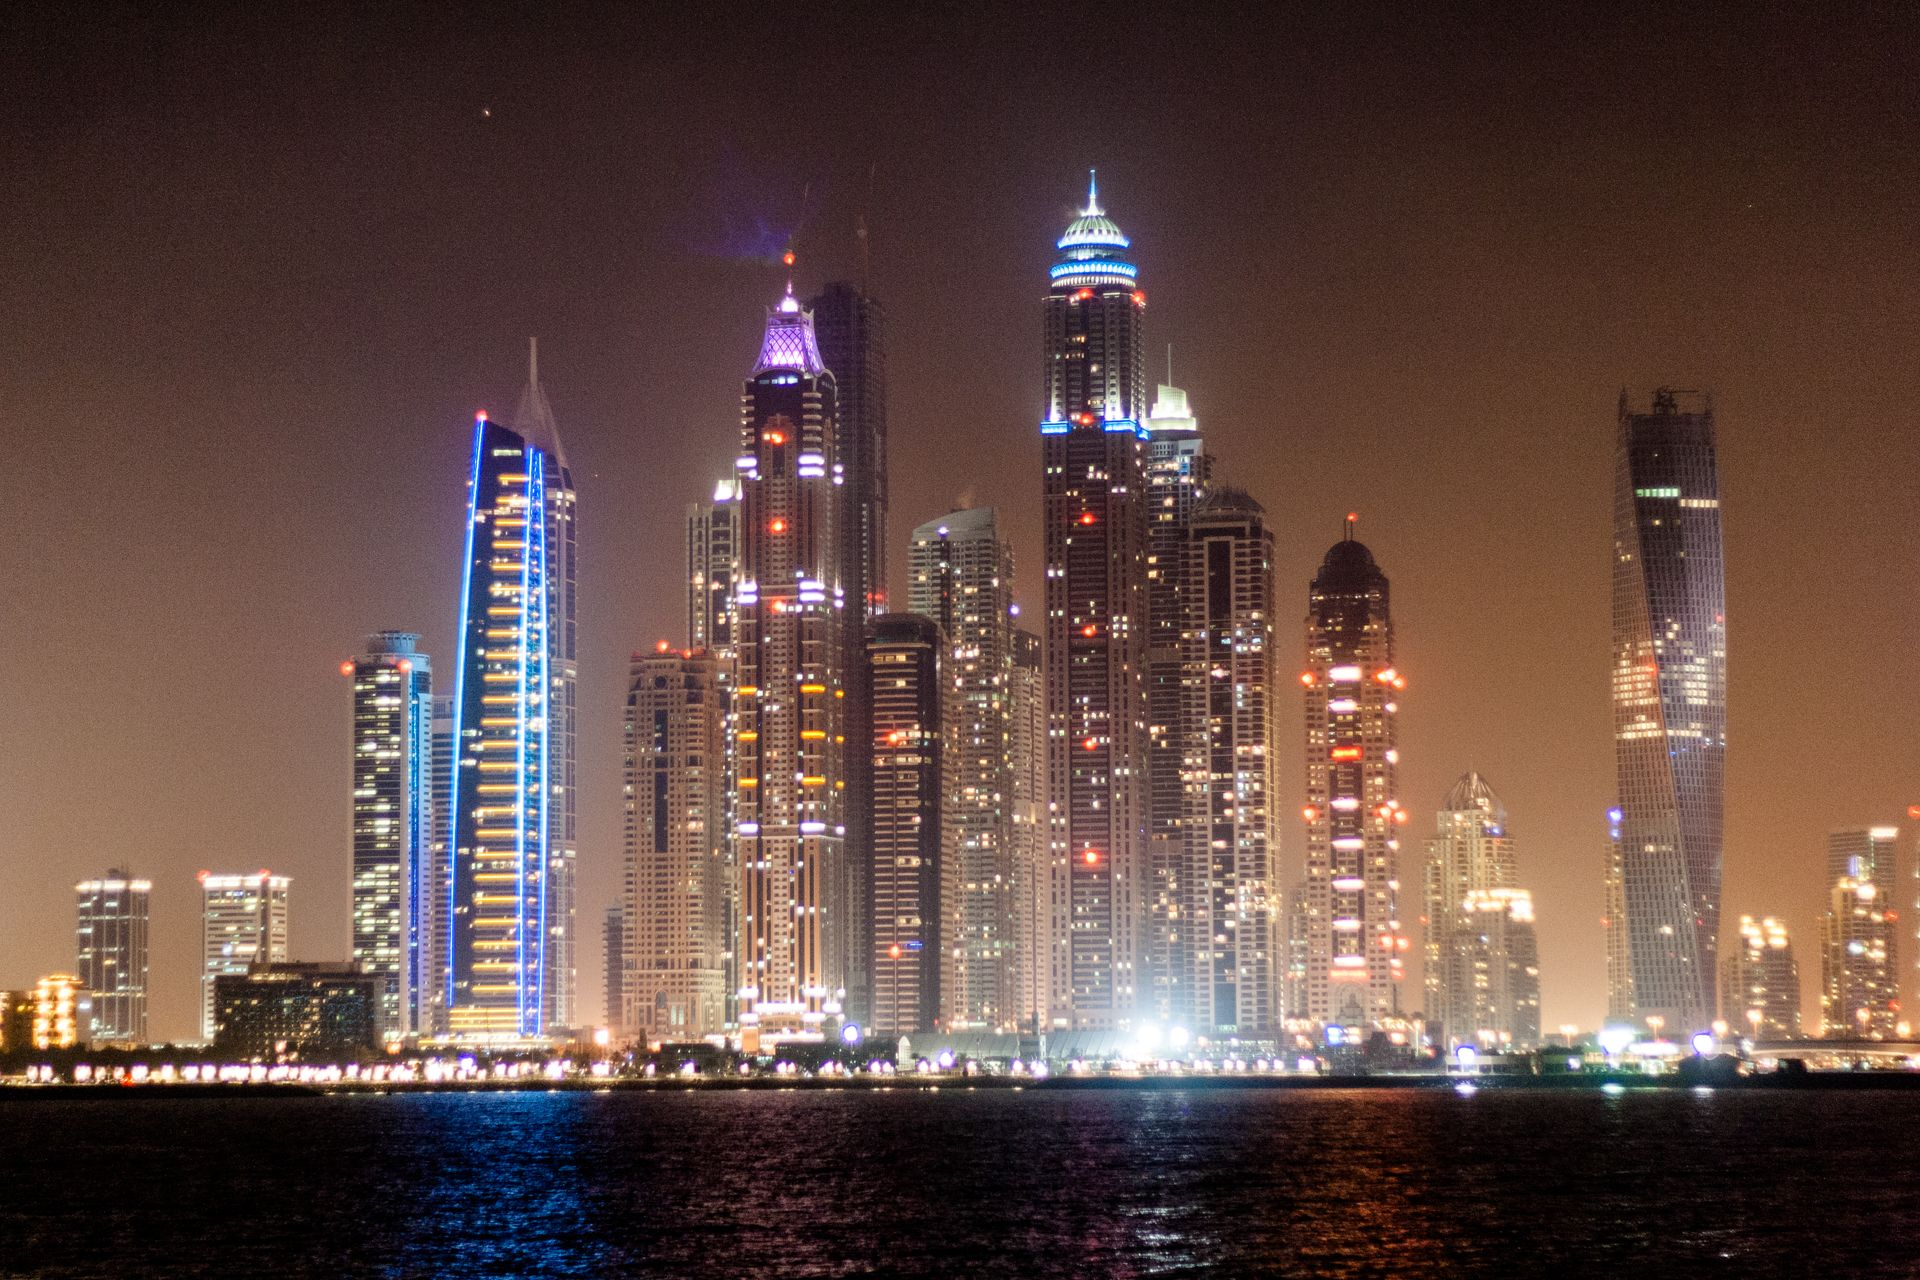 Dubai Marina at Night #UAE #Dubai #Emirates #Tower #Marina #Night #Lights